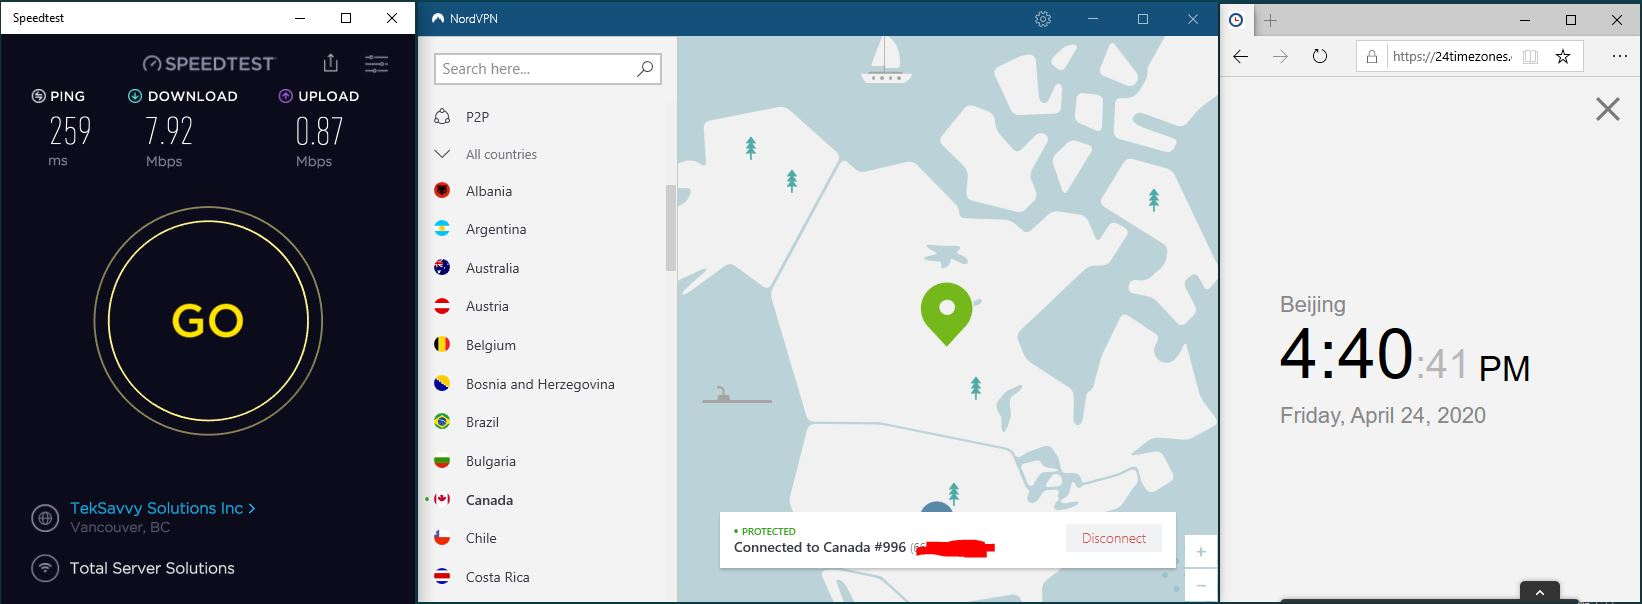 Windows10 NordVPN Canada #996 中国VPN 翻墙 科学上网 SpeedTest测速-20200424